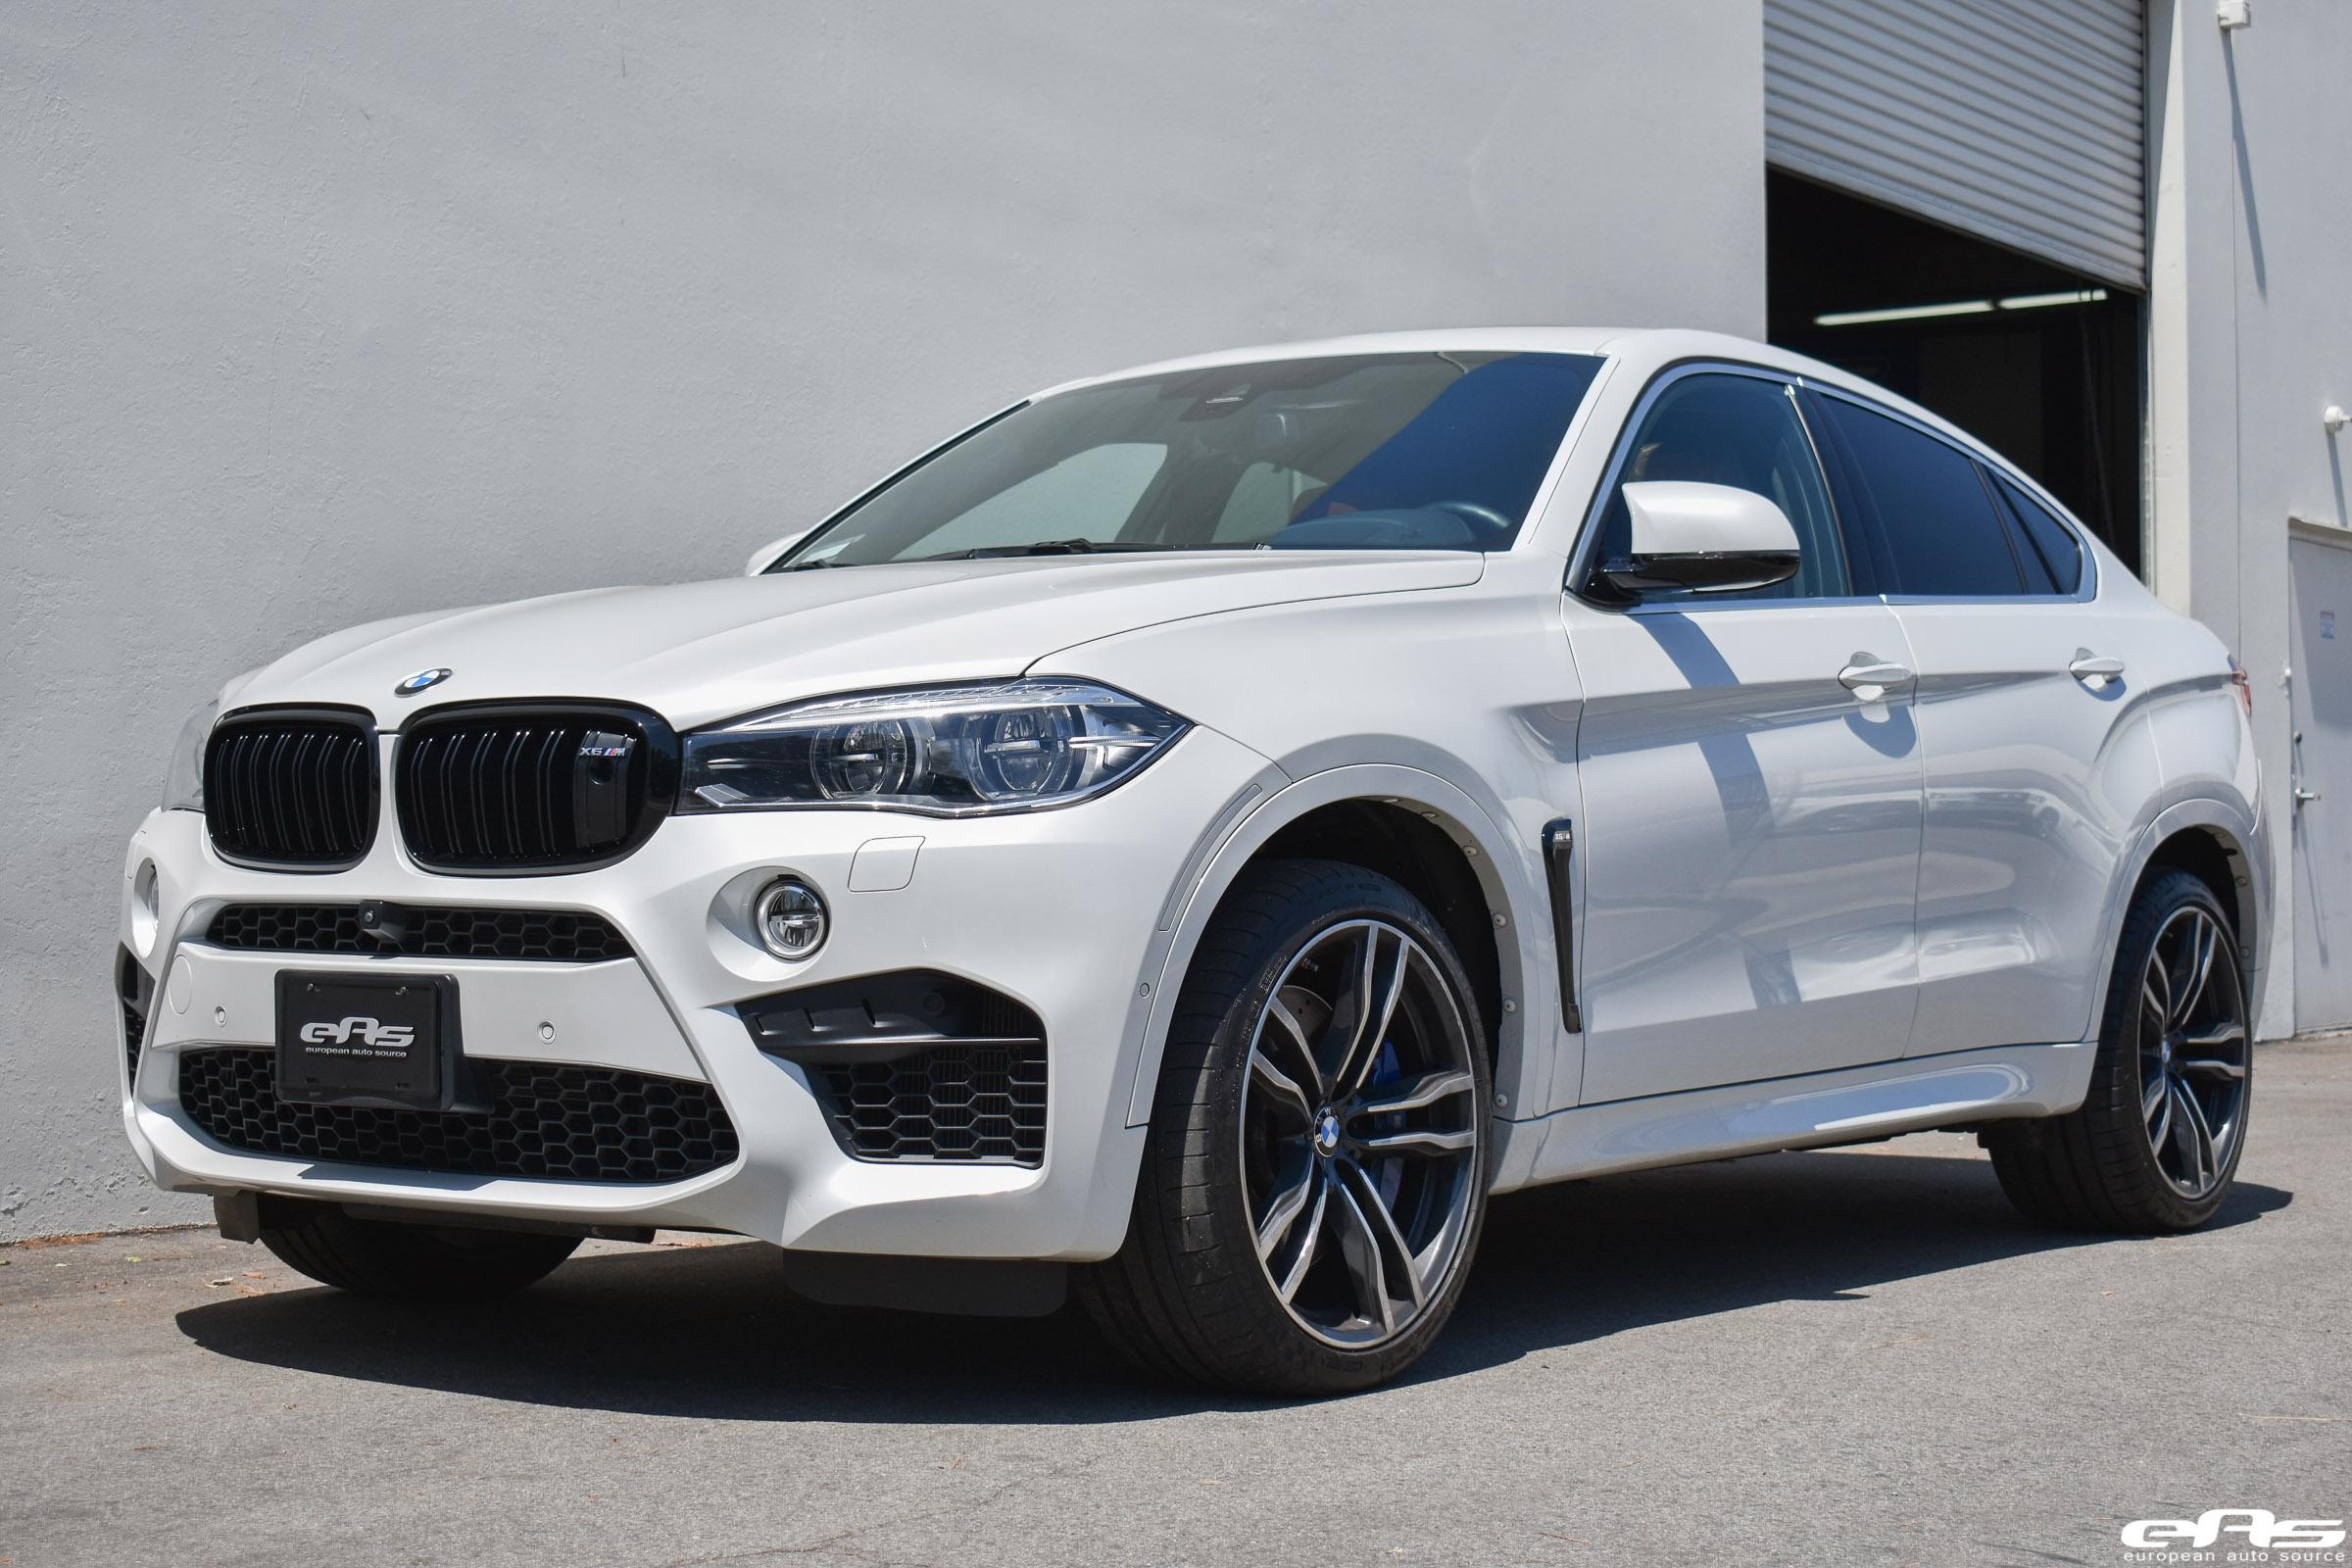 Mineral White BMW F86 X6 M